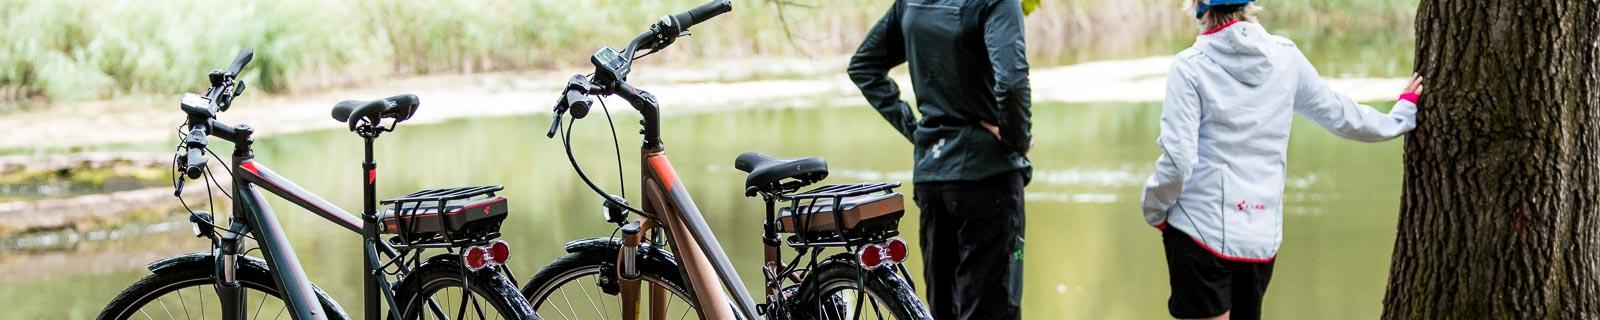 E-Bike da Trekking